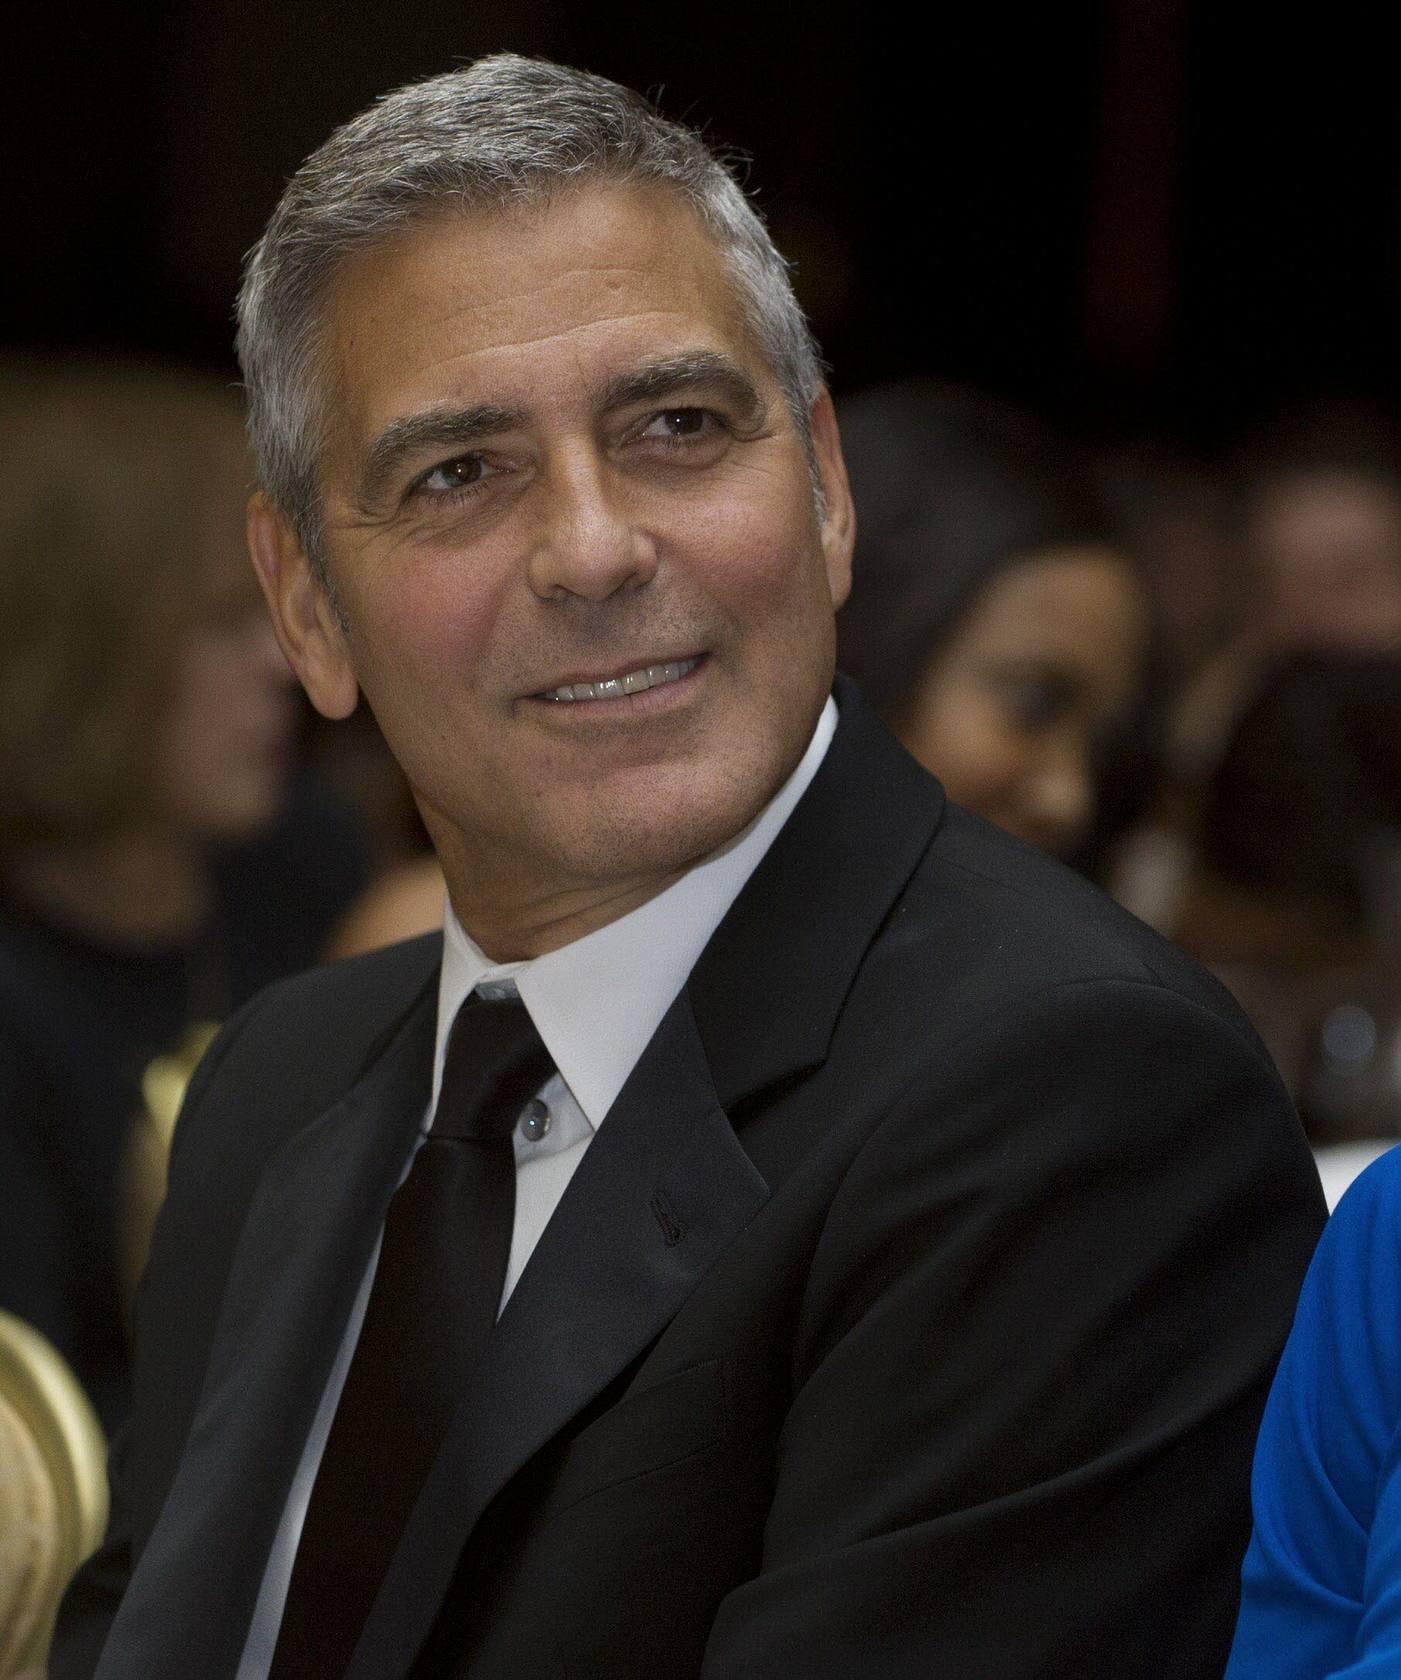 El irresistible George Clooney